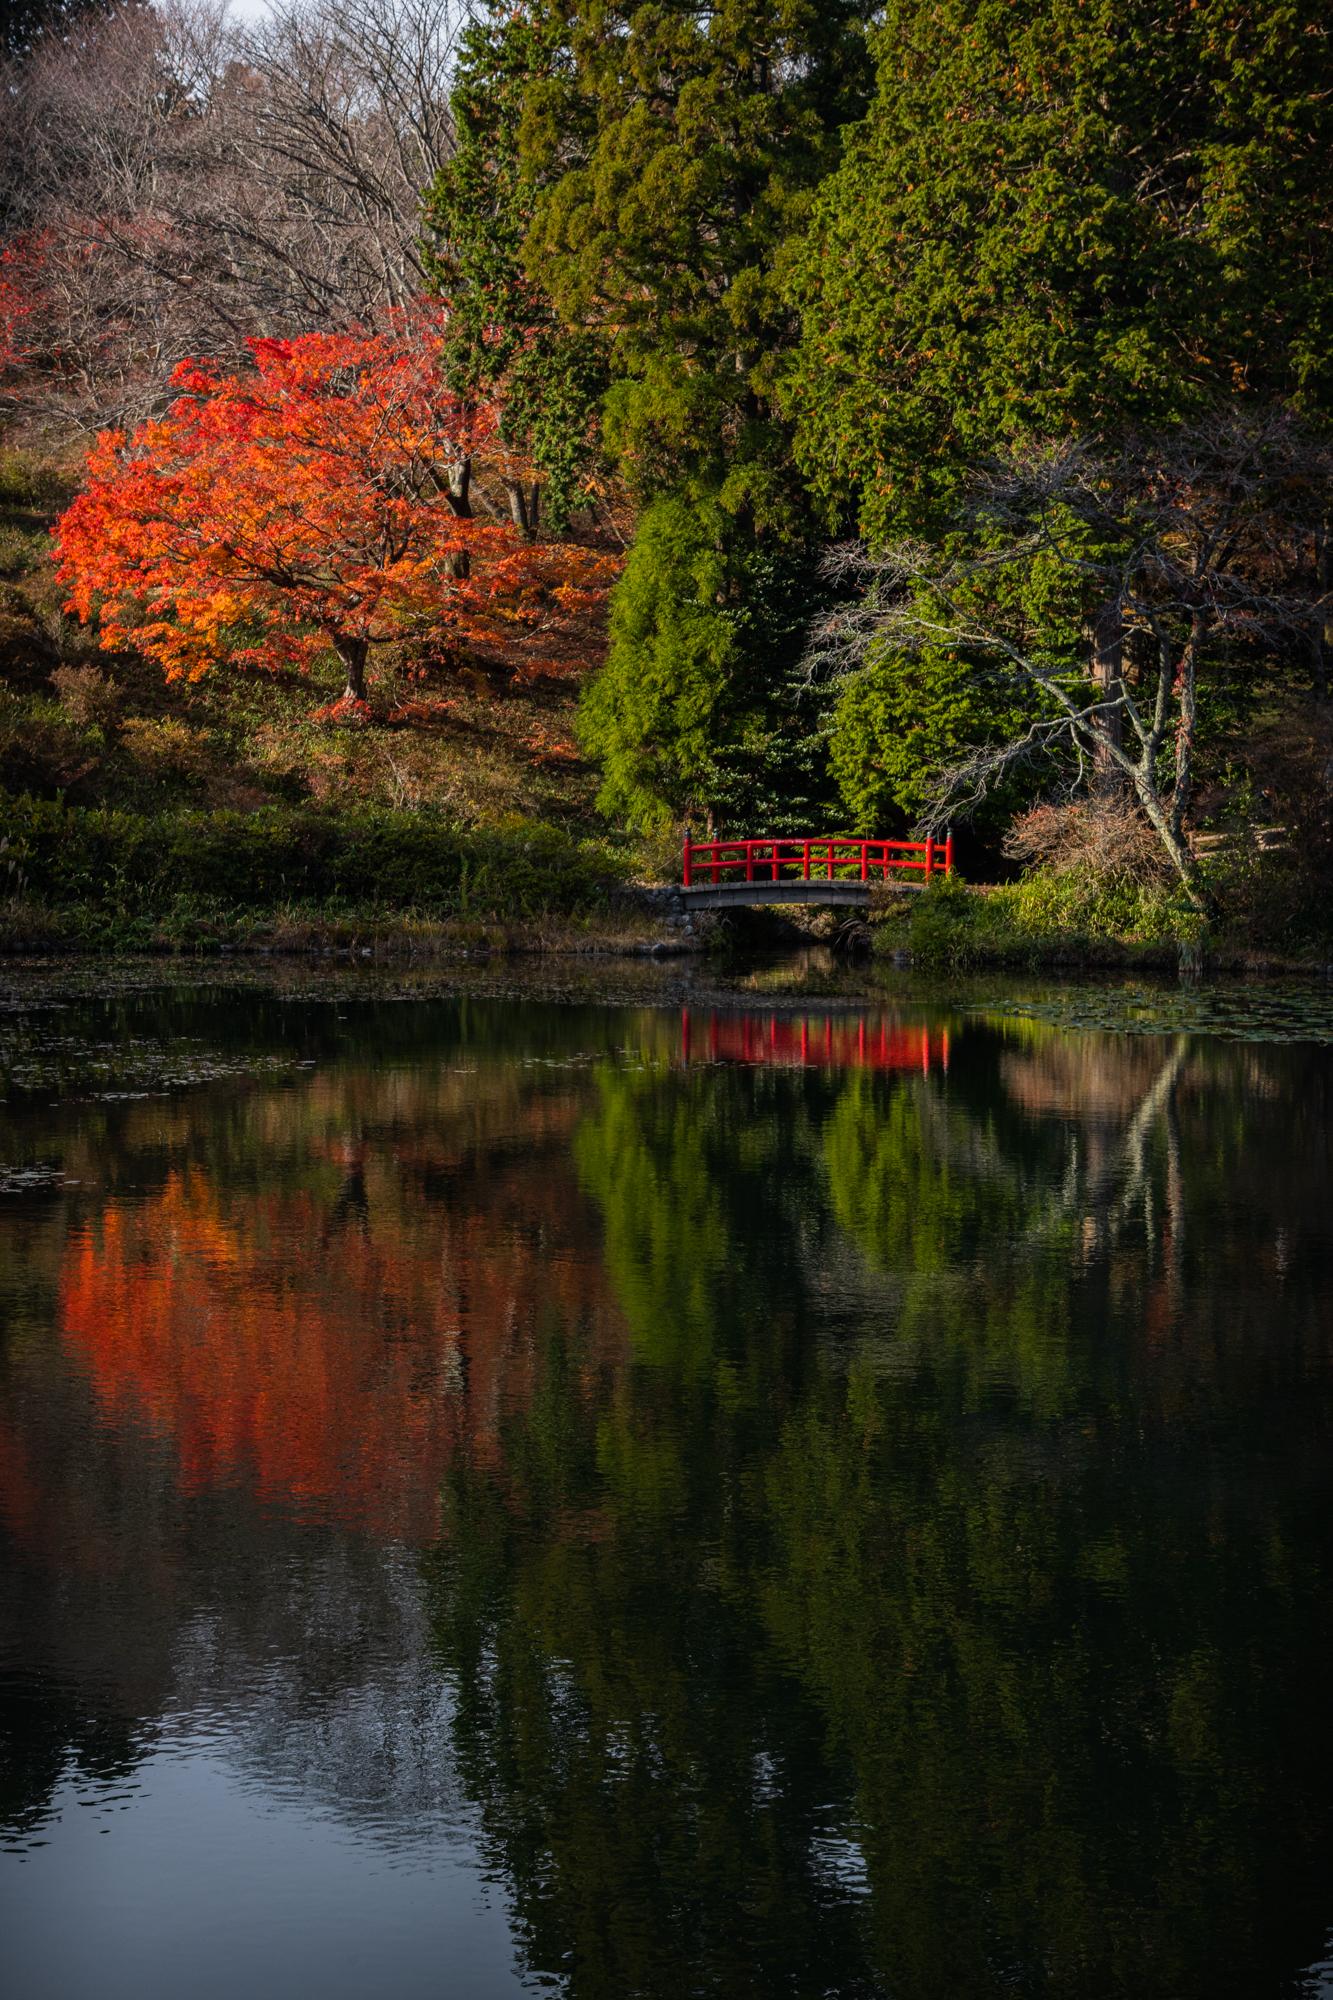 NIKON-CORPORATION_NIKON-D850_3240167410-3240274554_21933 奈良県  鳥見山公園( 秋におすすめ! 池の赤い橋が美しい紅葉のリフレクション景色! 撮影した写真の紹介、 アクセス情報や撮影ポイントなど!)